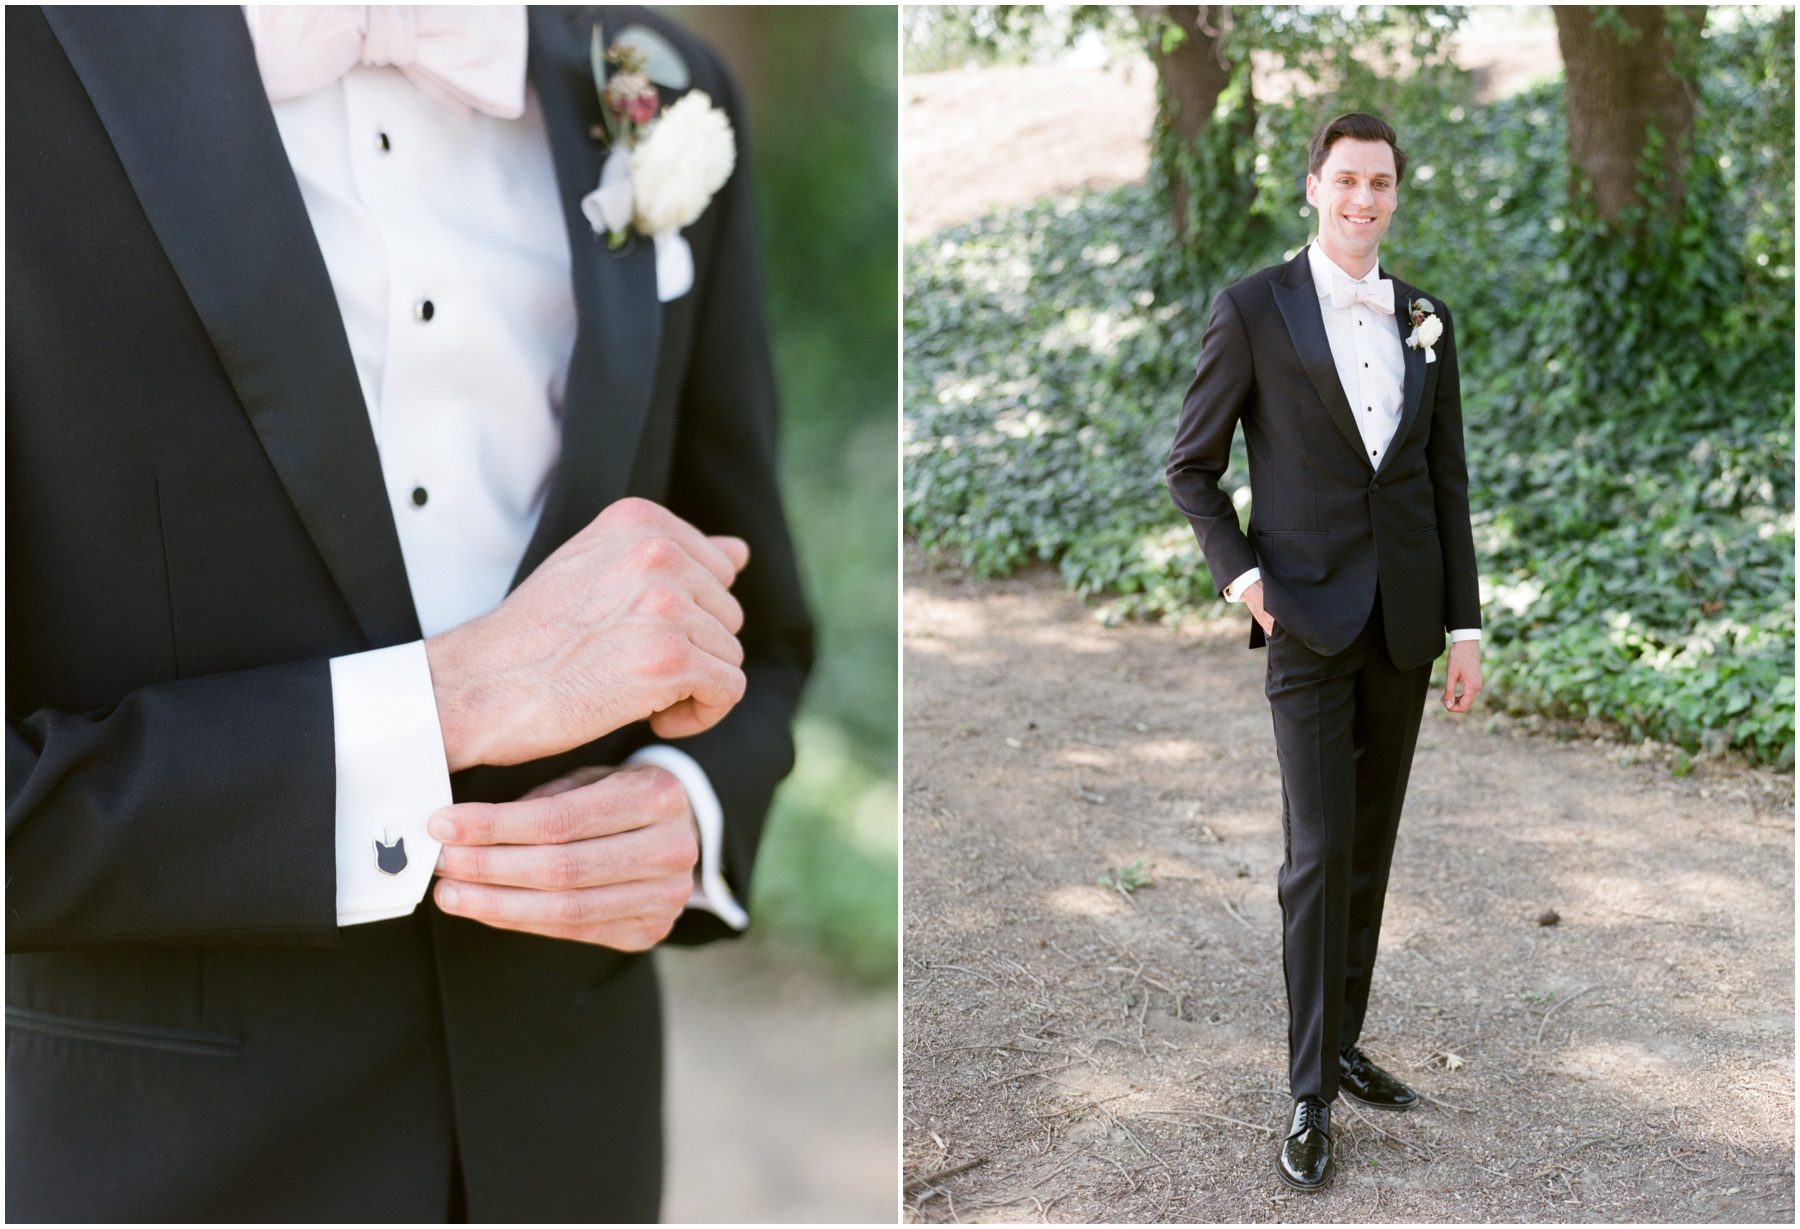 Scribner-bend-vineyards-wedding-sacramento-california-Kristine-Herman-Photography-41.jpg